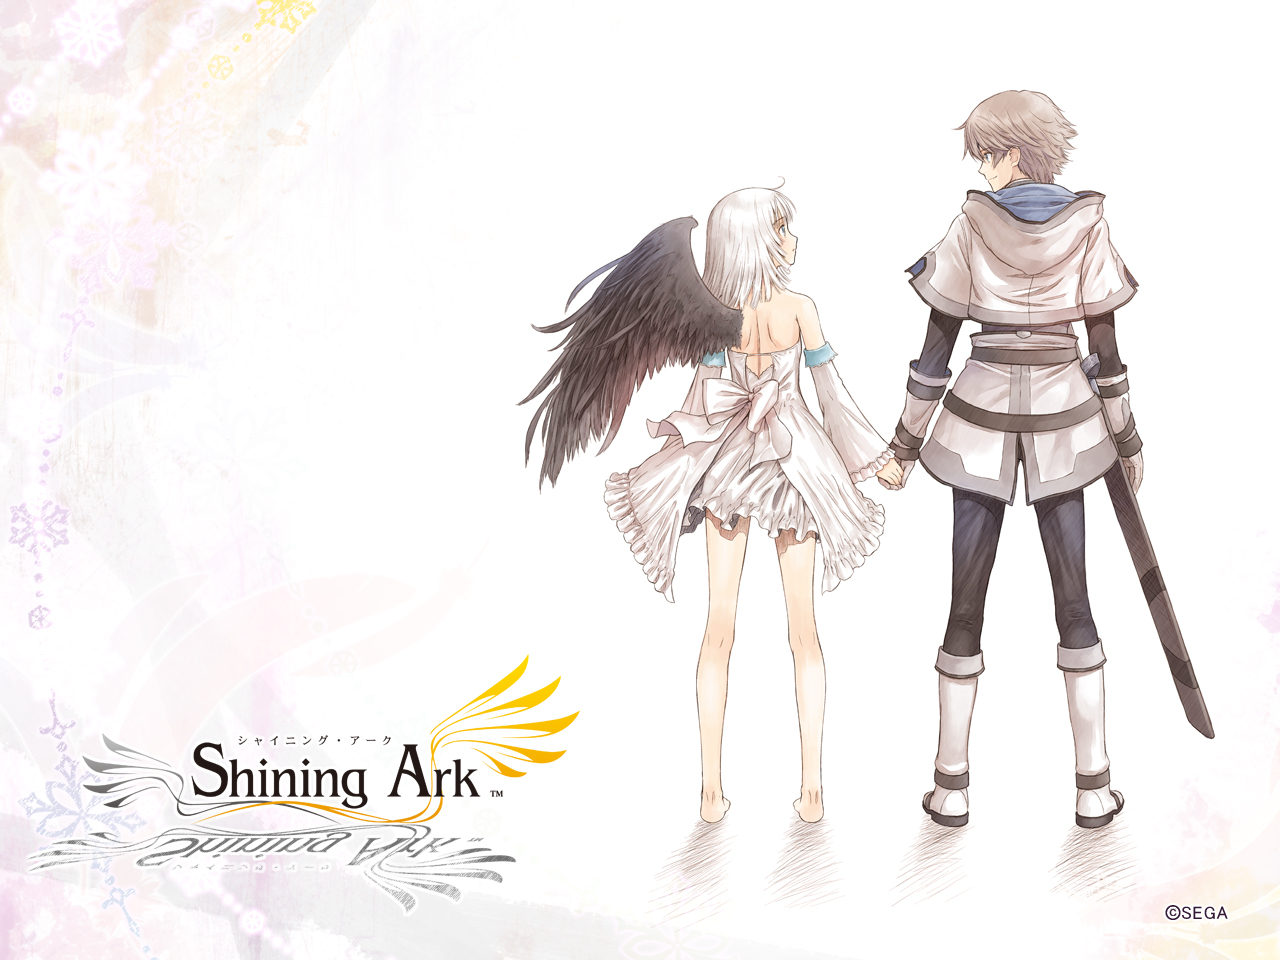 Shining.Ark.full.1447182.jpg